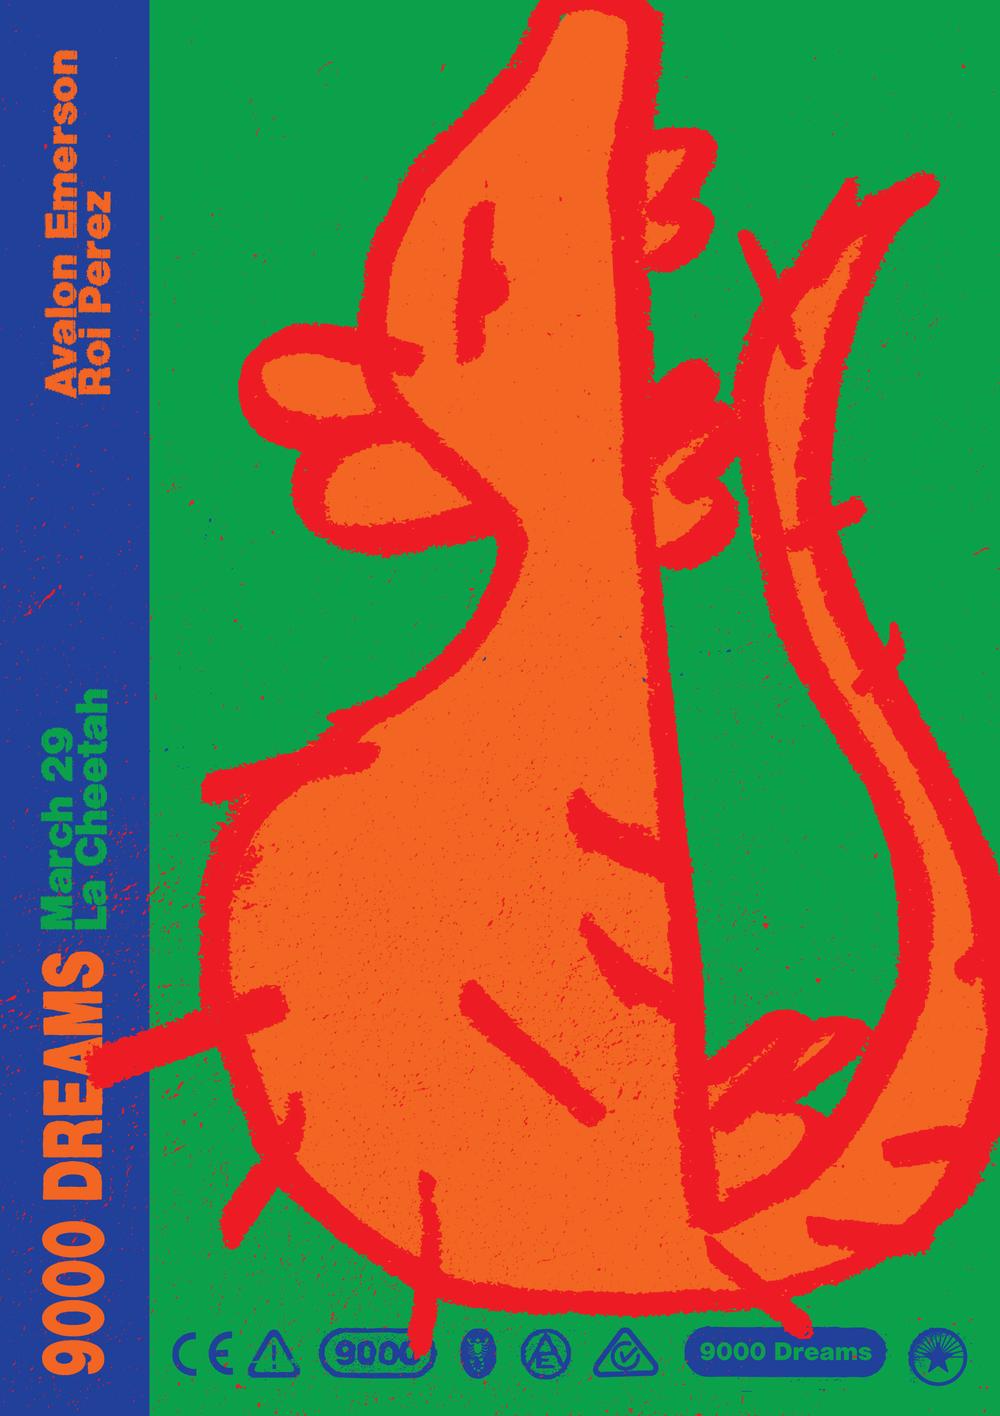 9000 Dreams at La Cheetah: A series of nights by  Avalon Emerson